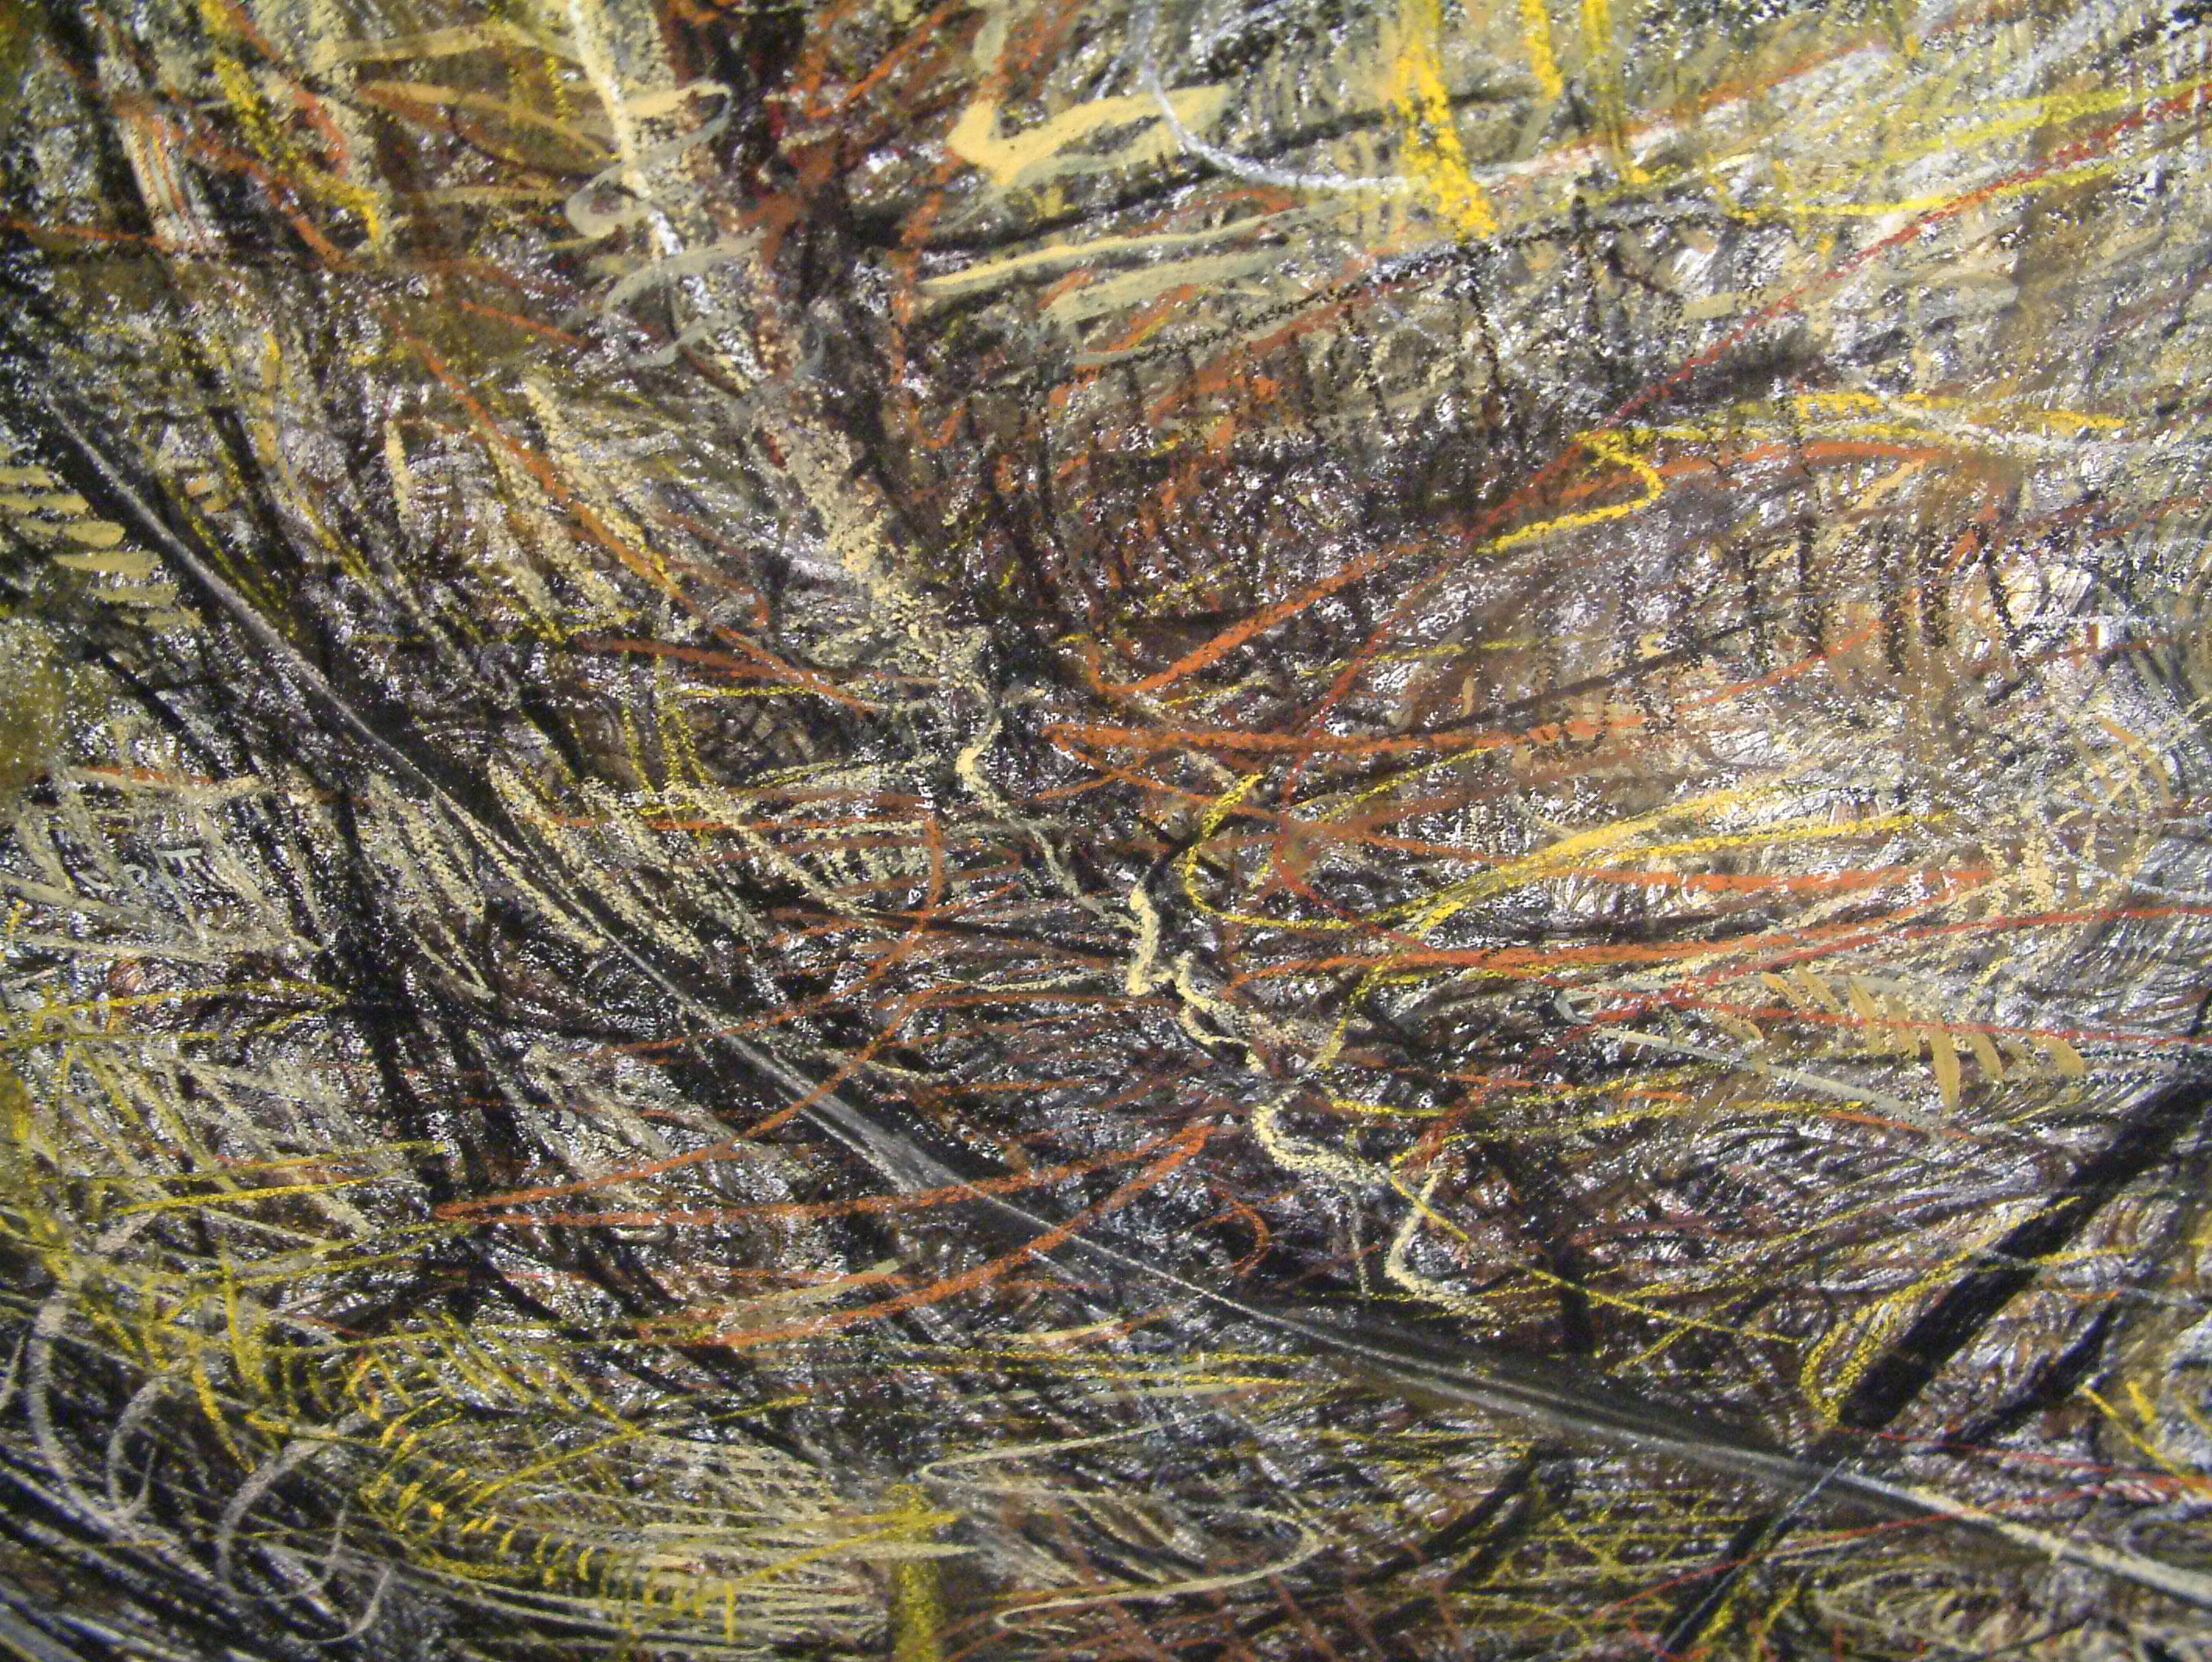 rohini-devasher-copyright-seed-wall-drawing-2004 (4)